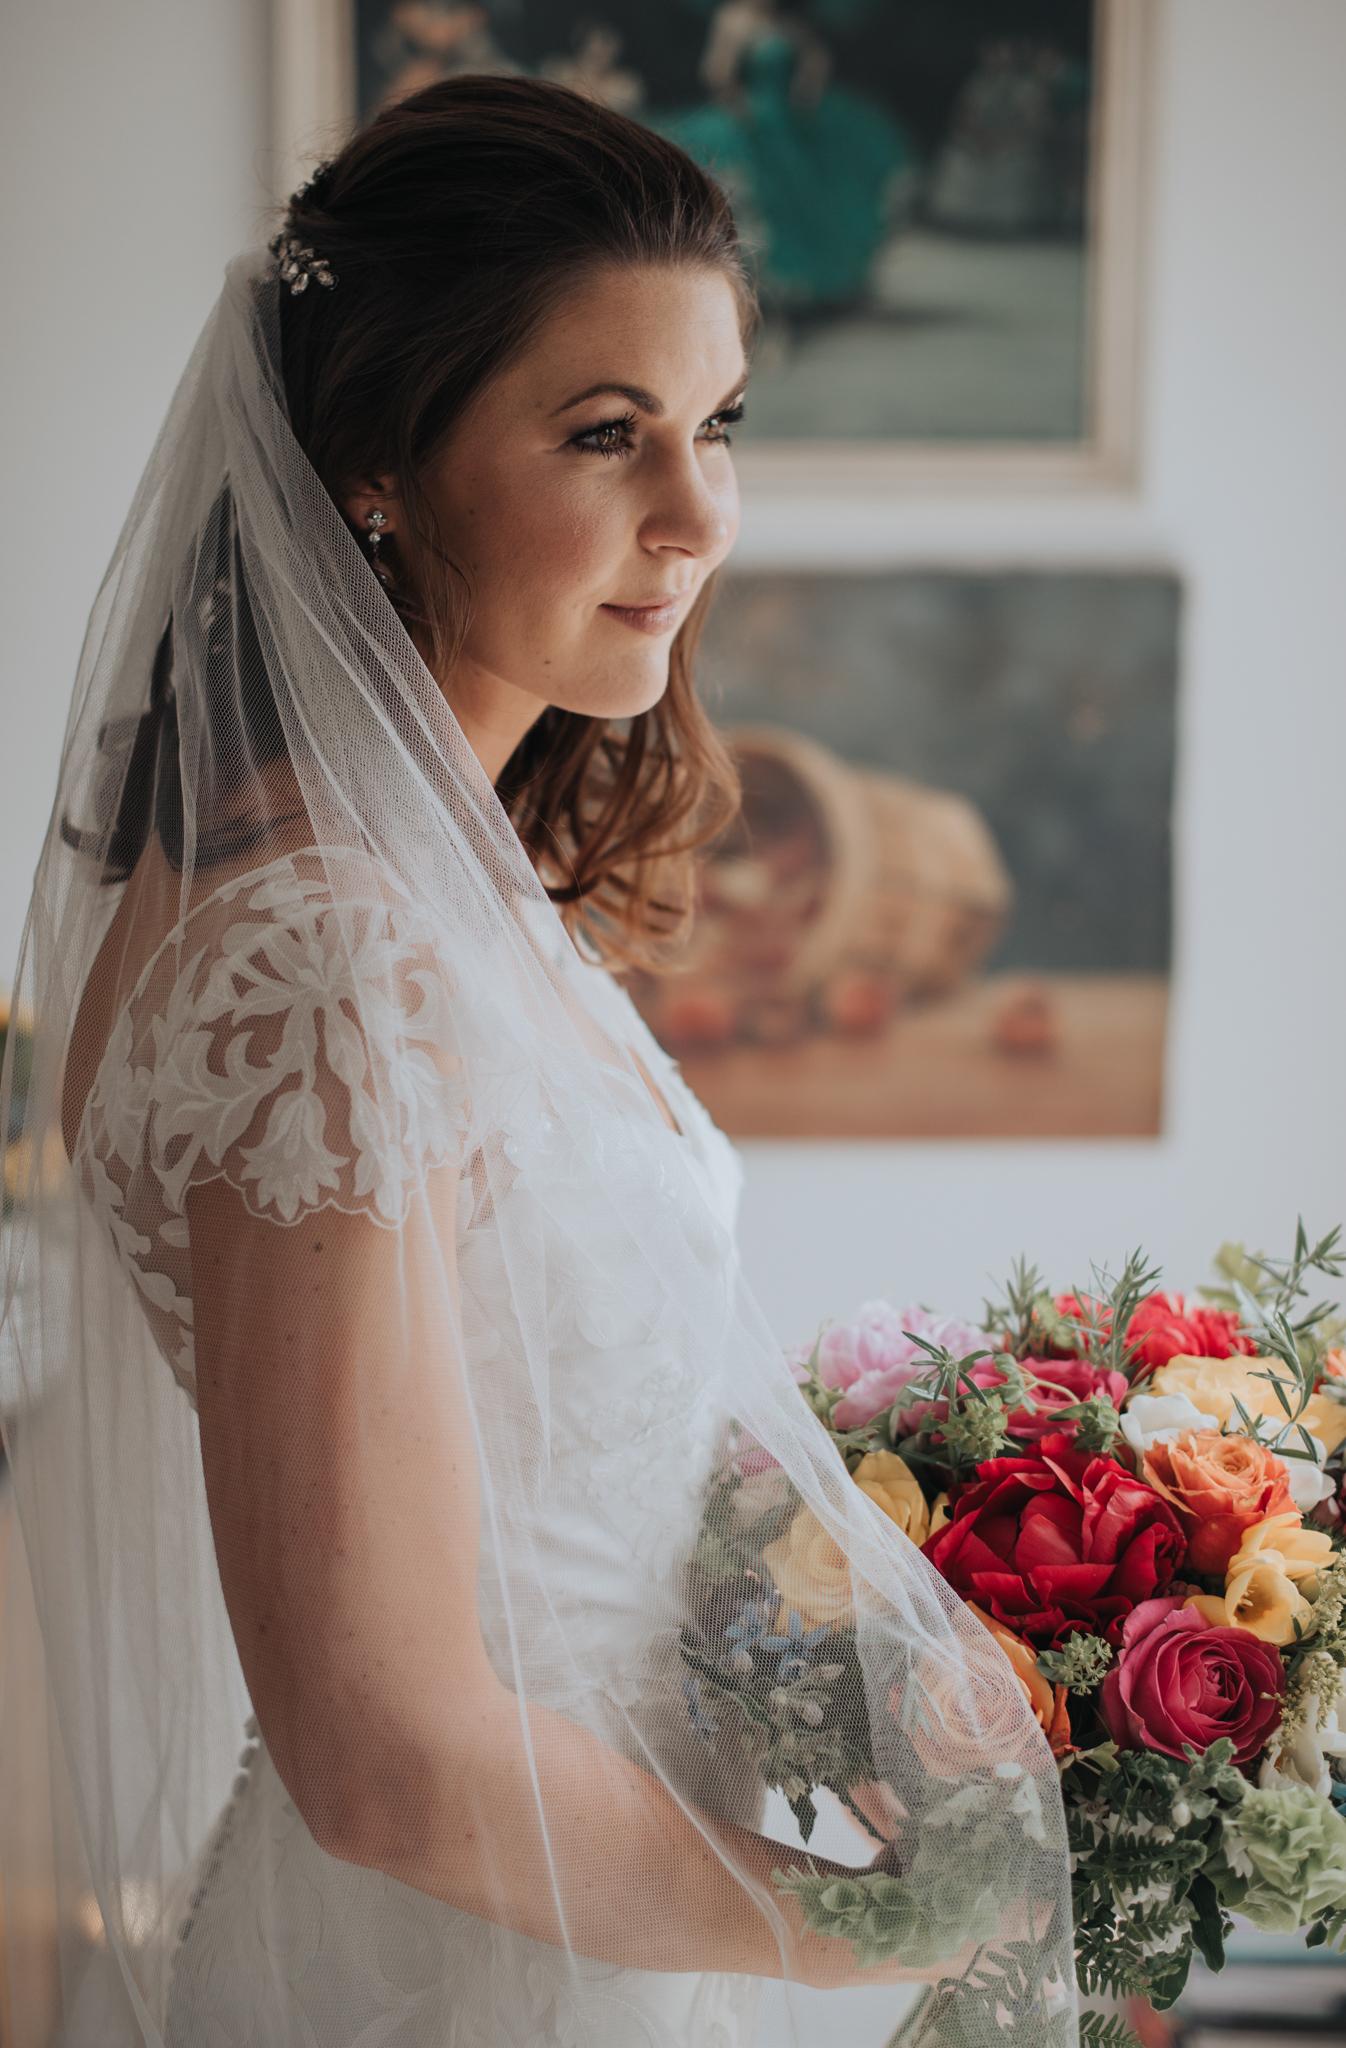 LOVELENSCAPES PHOTOGRAPHY • VISUAL POETRY • NEW ZEALAND WEDDING PHOTOGRAPHER • AUSTRALIAN WEDDING PHOTOGRAPHER • BRISBANE • MELBOURNE • SYDNEY • HOBART • TARUREKA ESTATE • ANNA CAMPBELL • 86.jpg